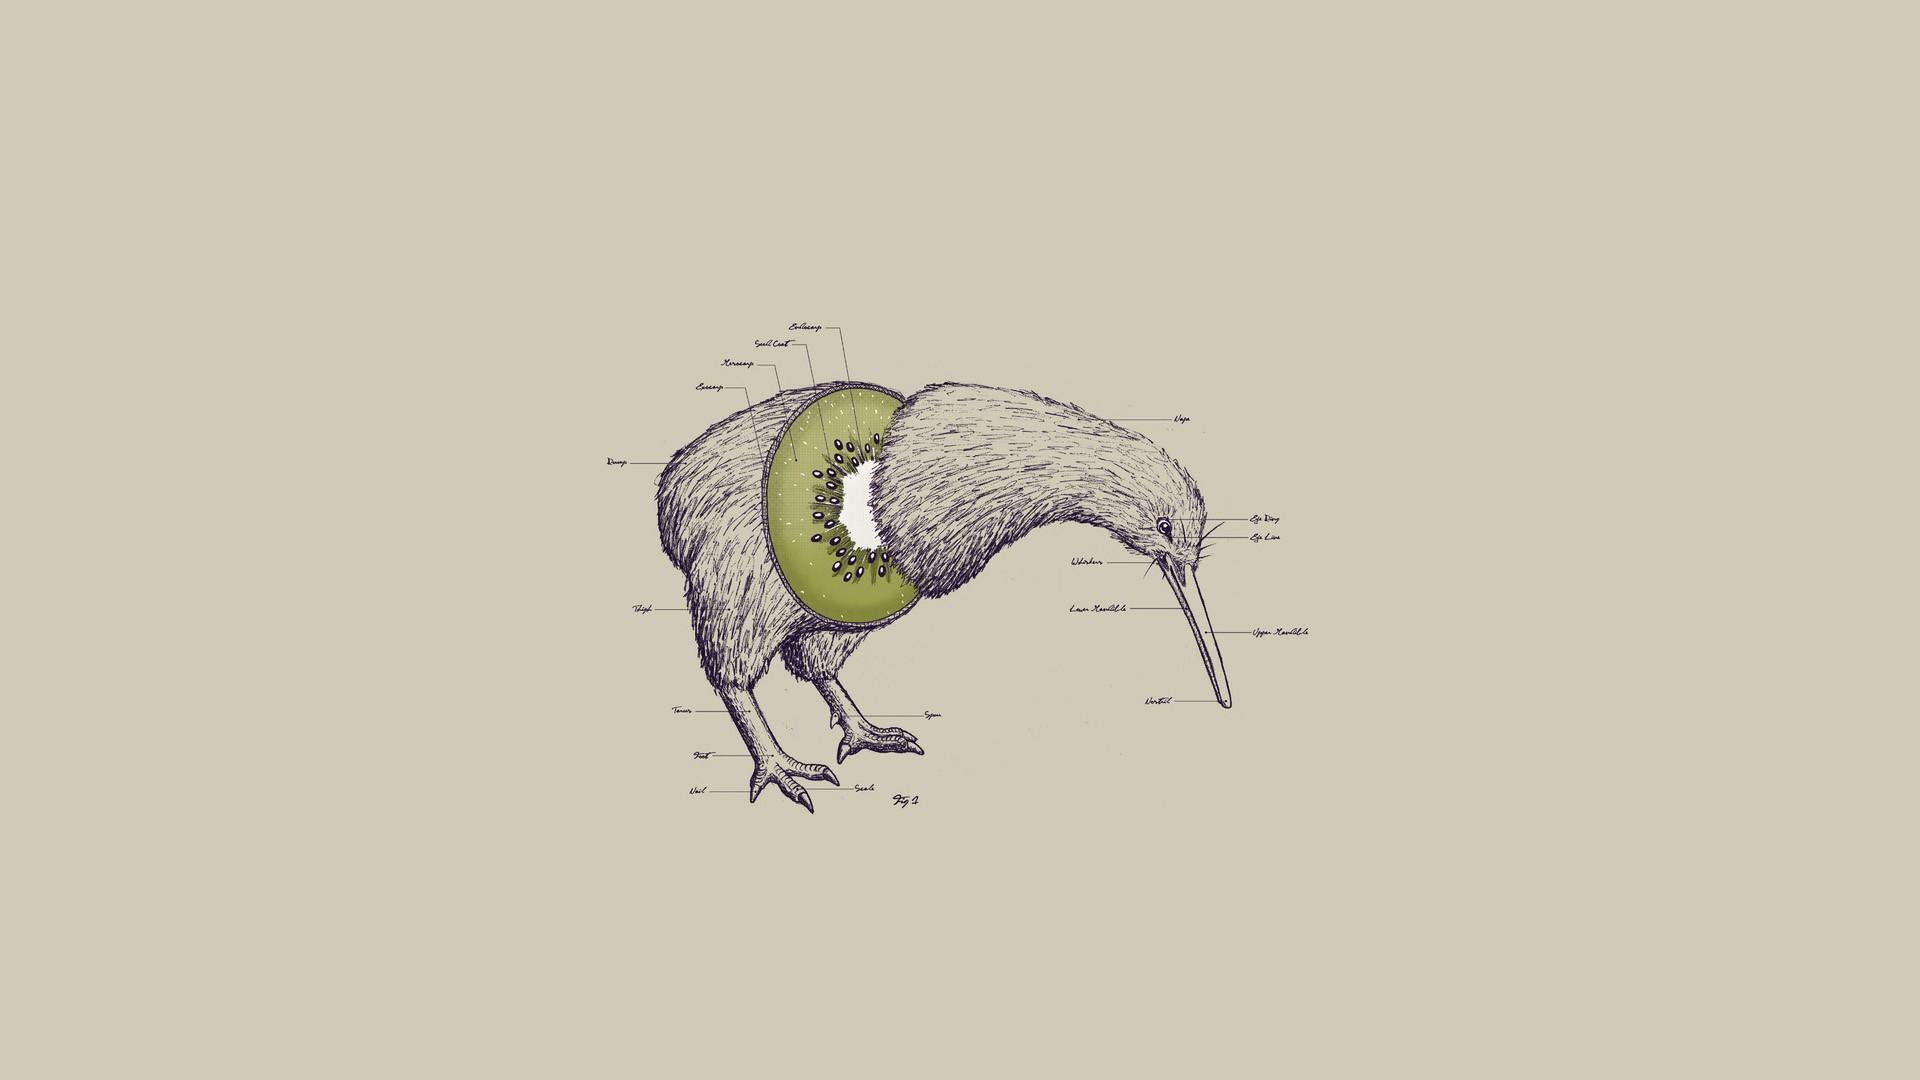 1920x1080 Wallpaper Drawing, Illustration, Birds, Animals, Abstract